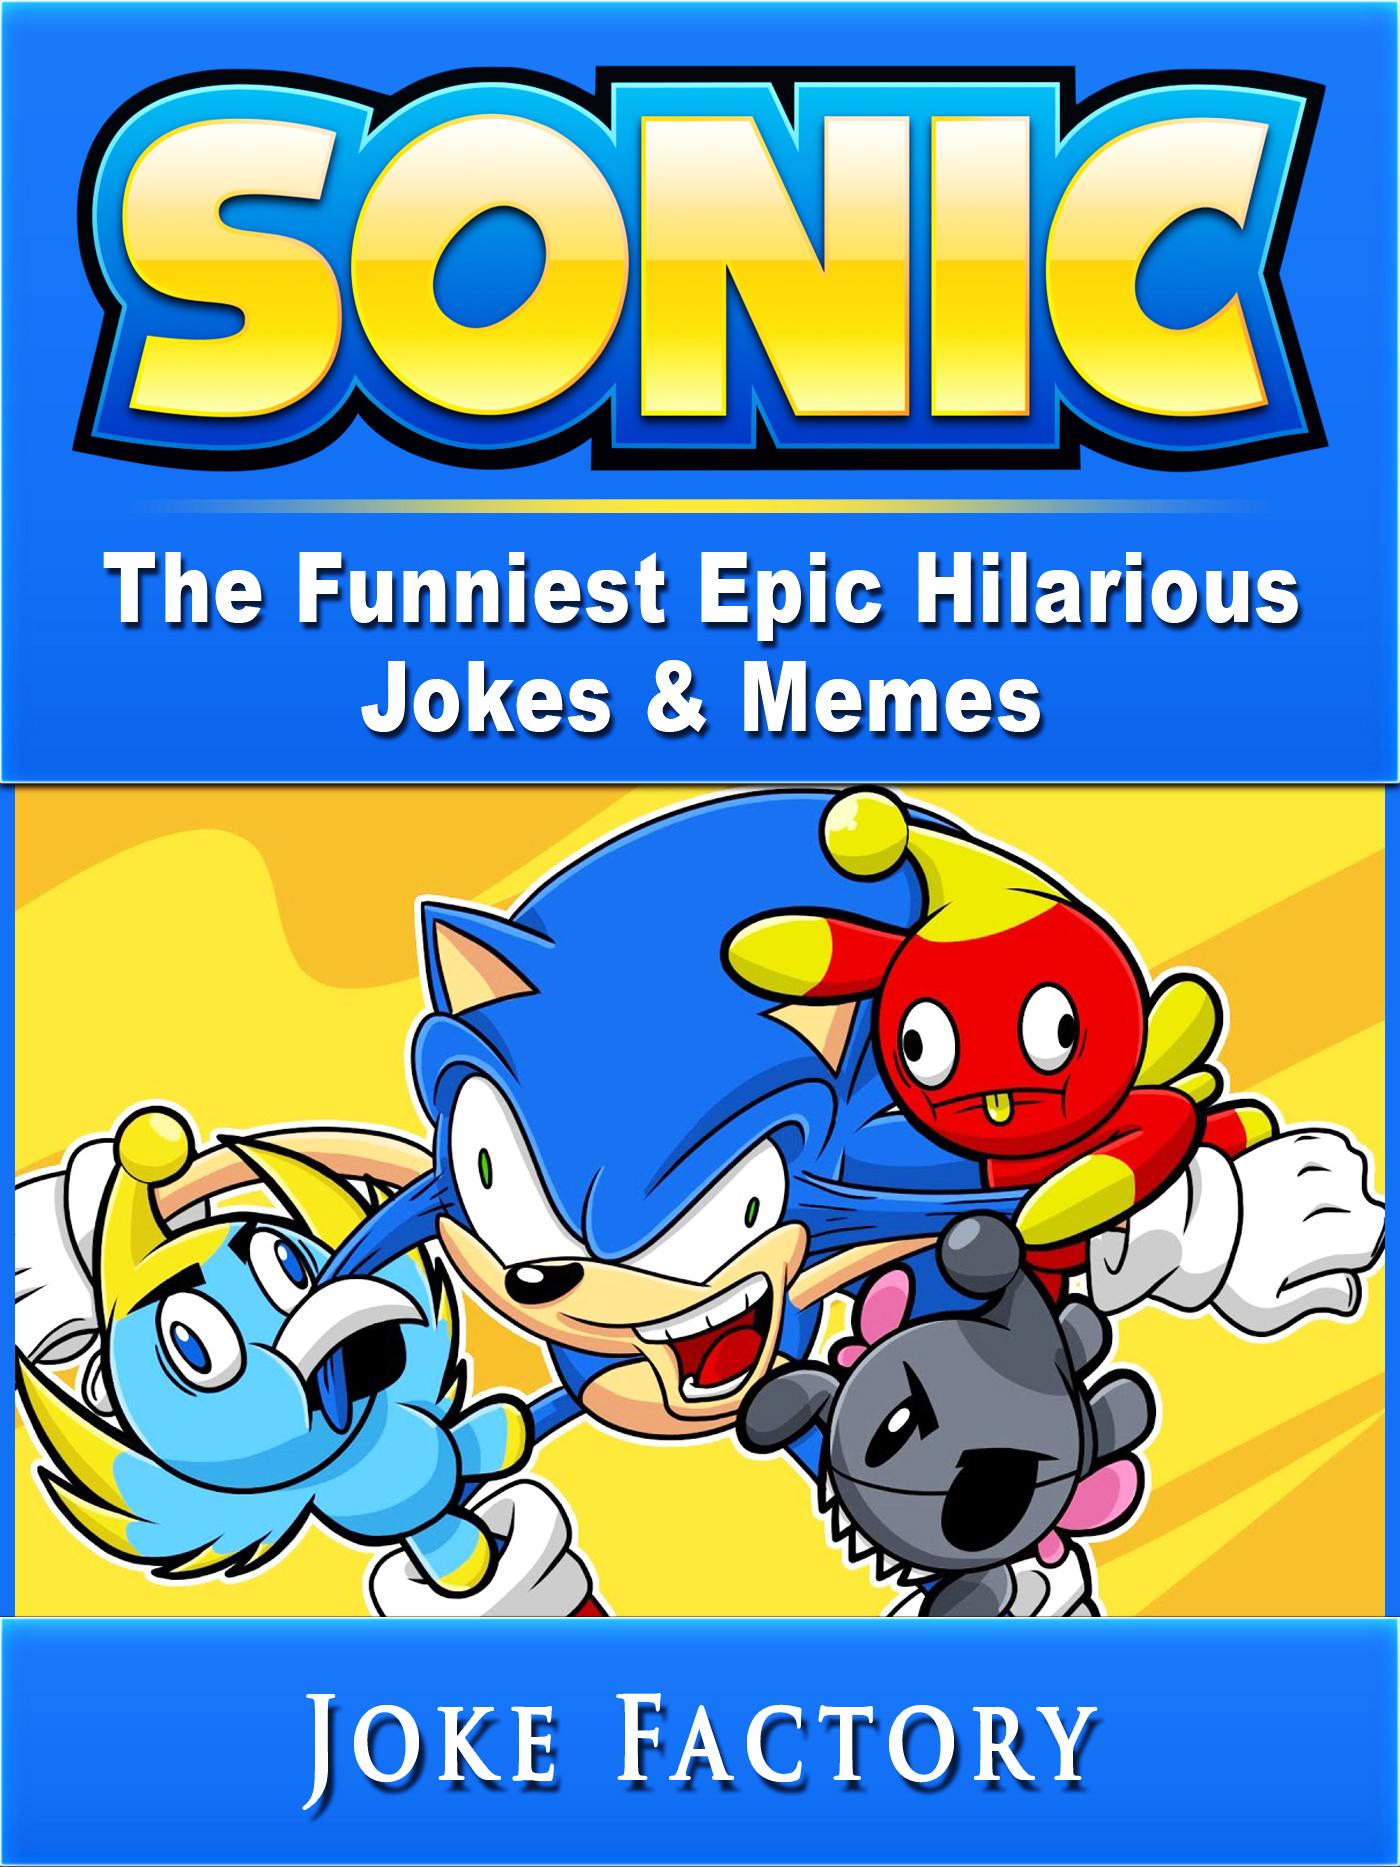 Sonic the funniest epic hilarious jokes & memes